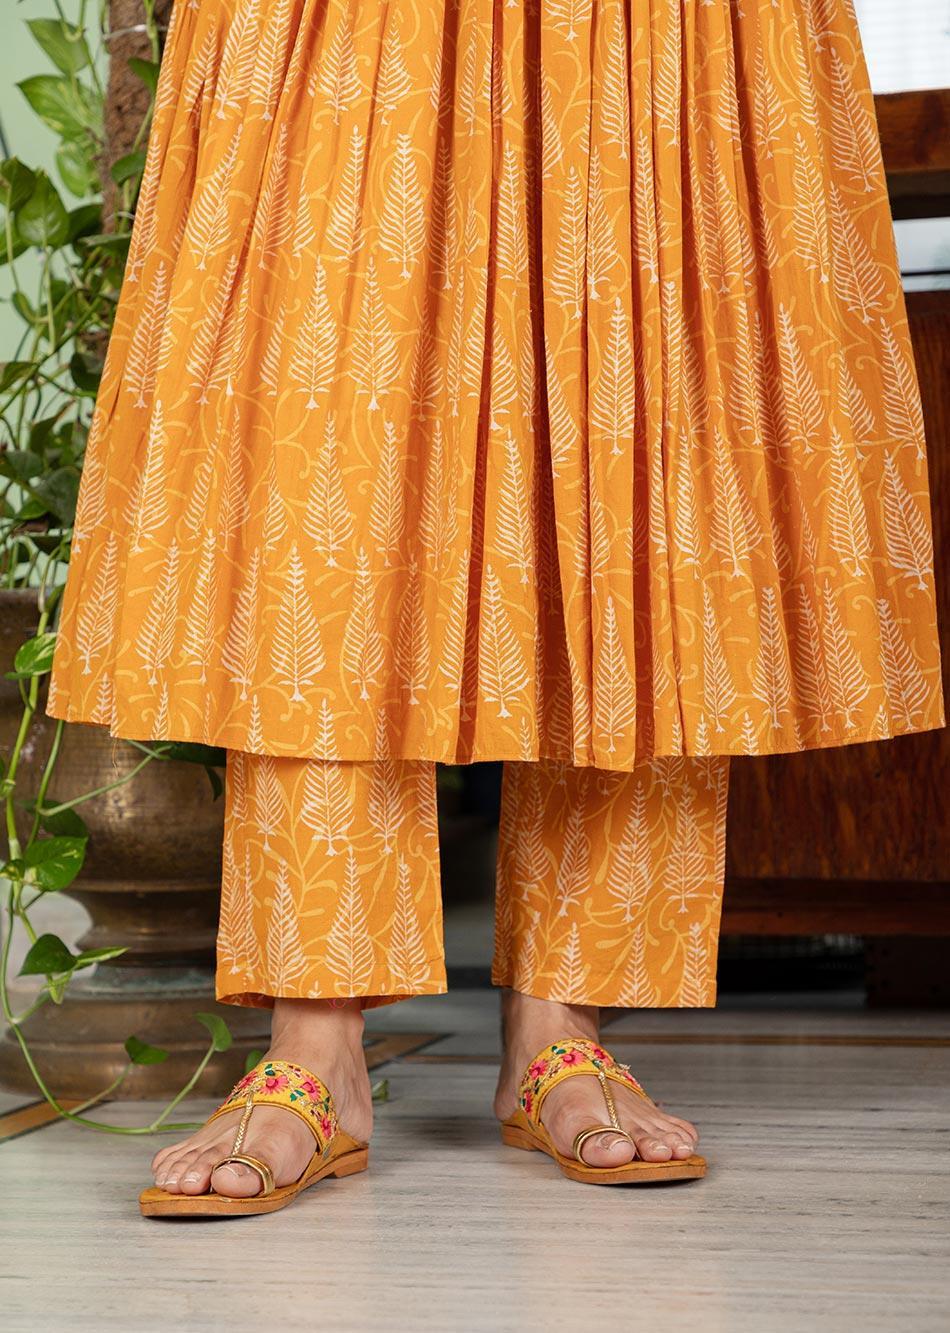 MOH Honey Gathered Anarkali Set (set of 3) By Jovi Fashion